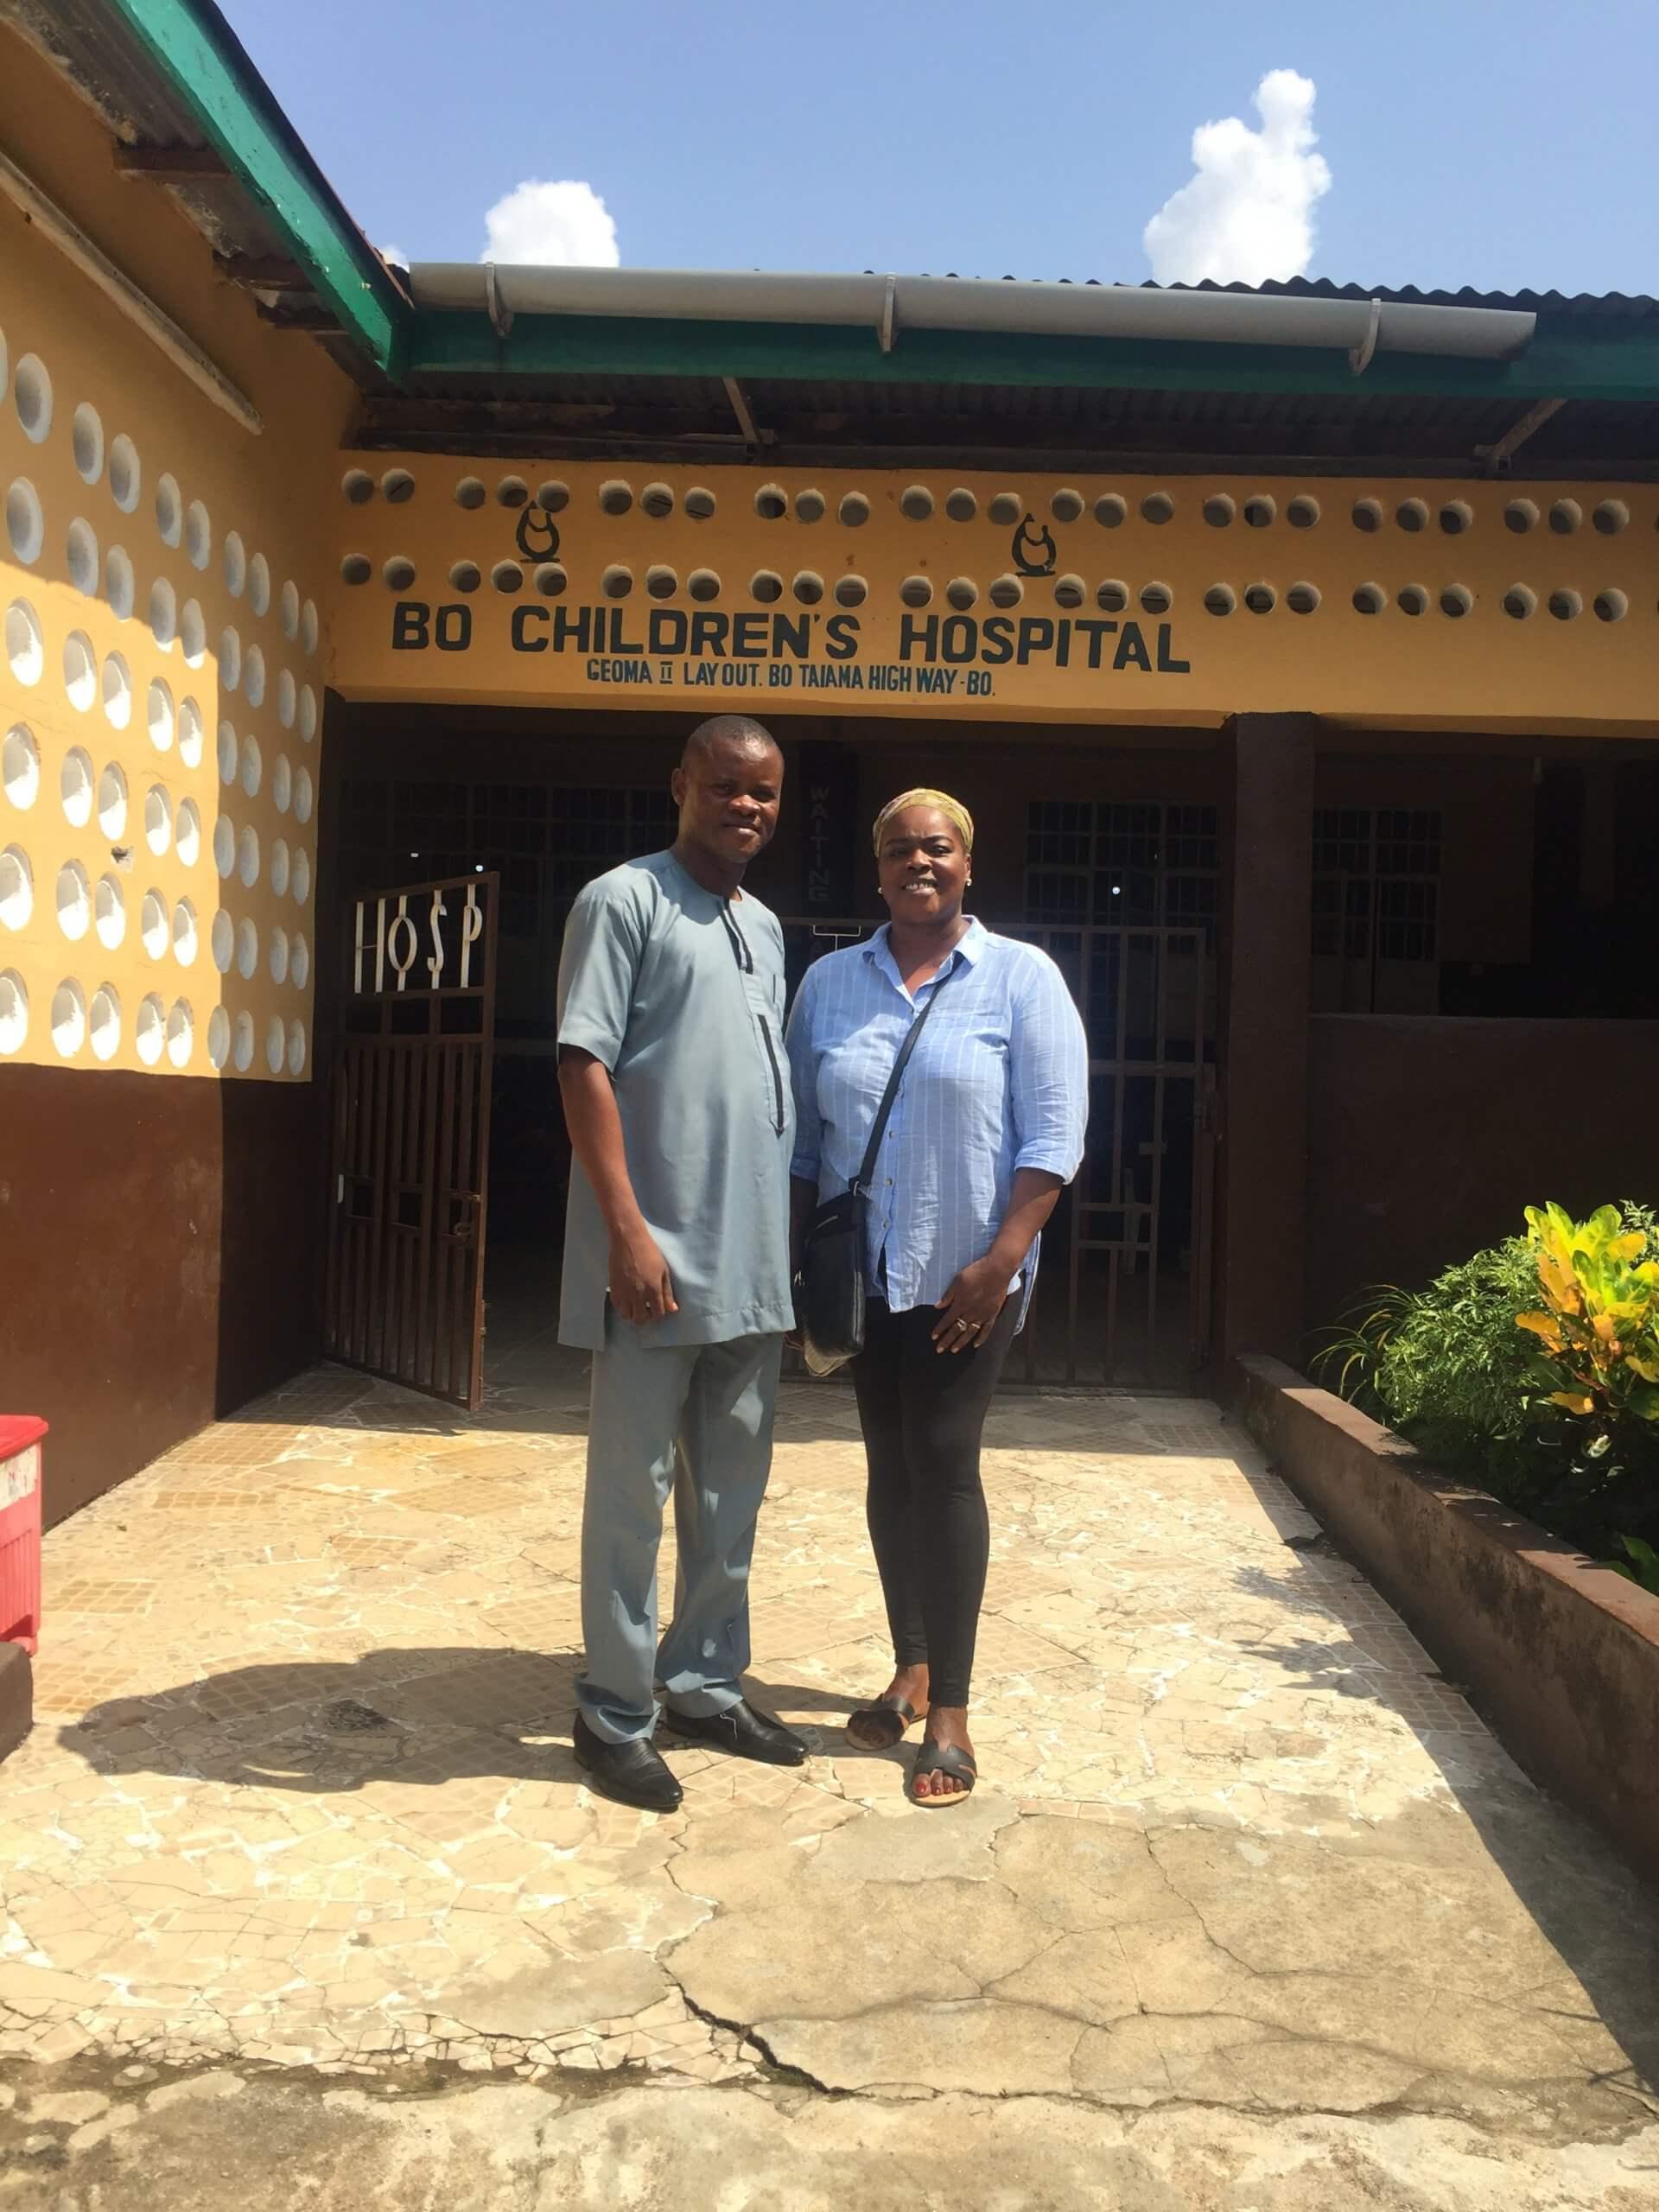 Mendewa Hospital, Bo